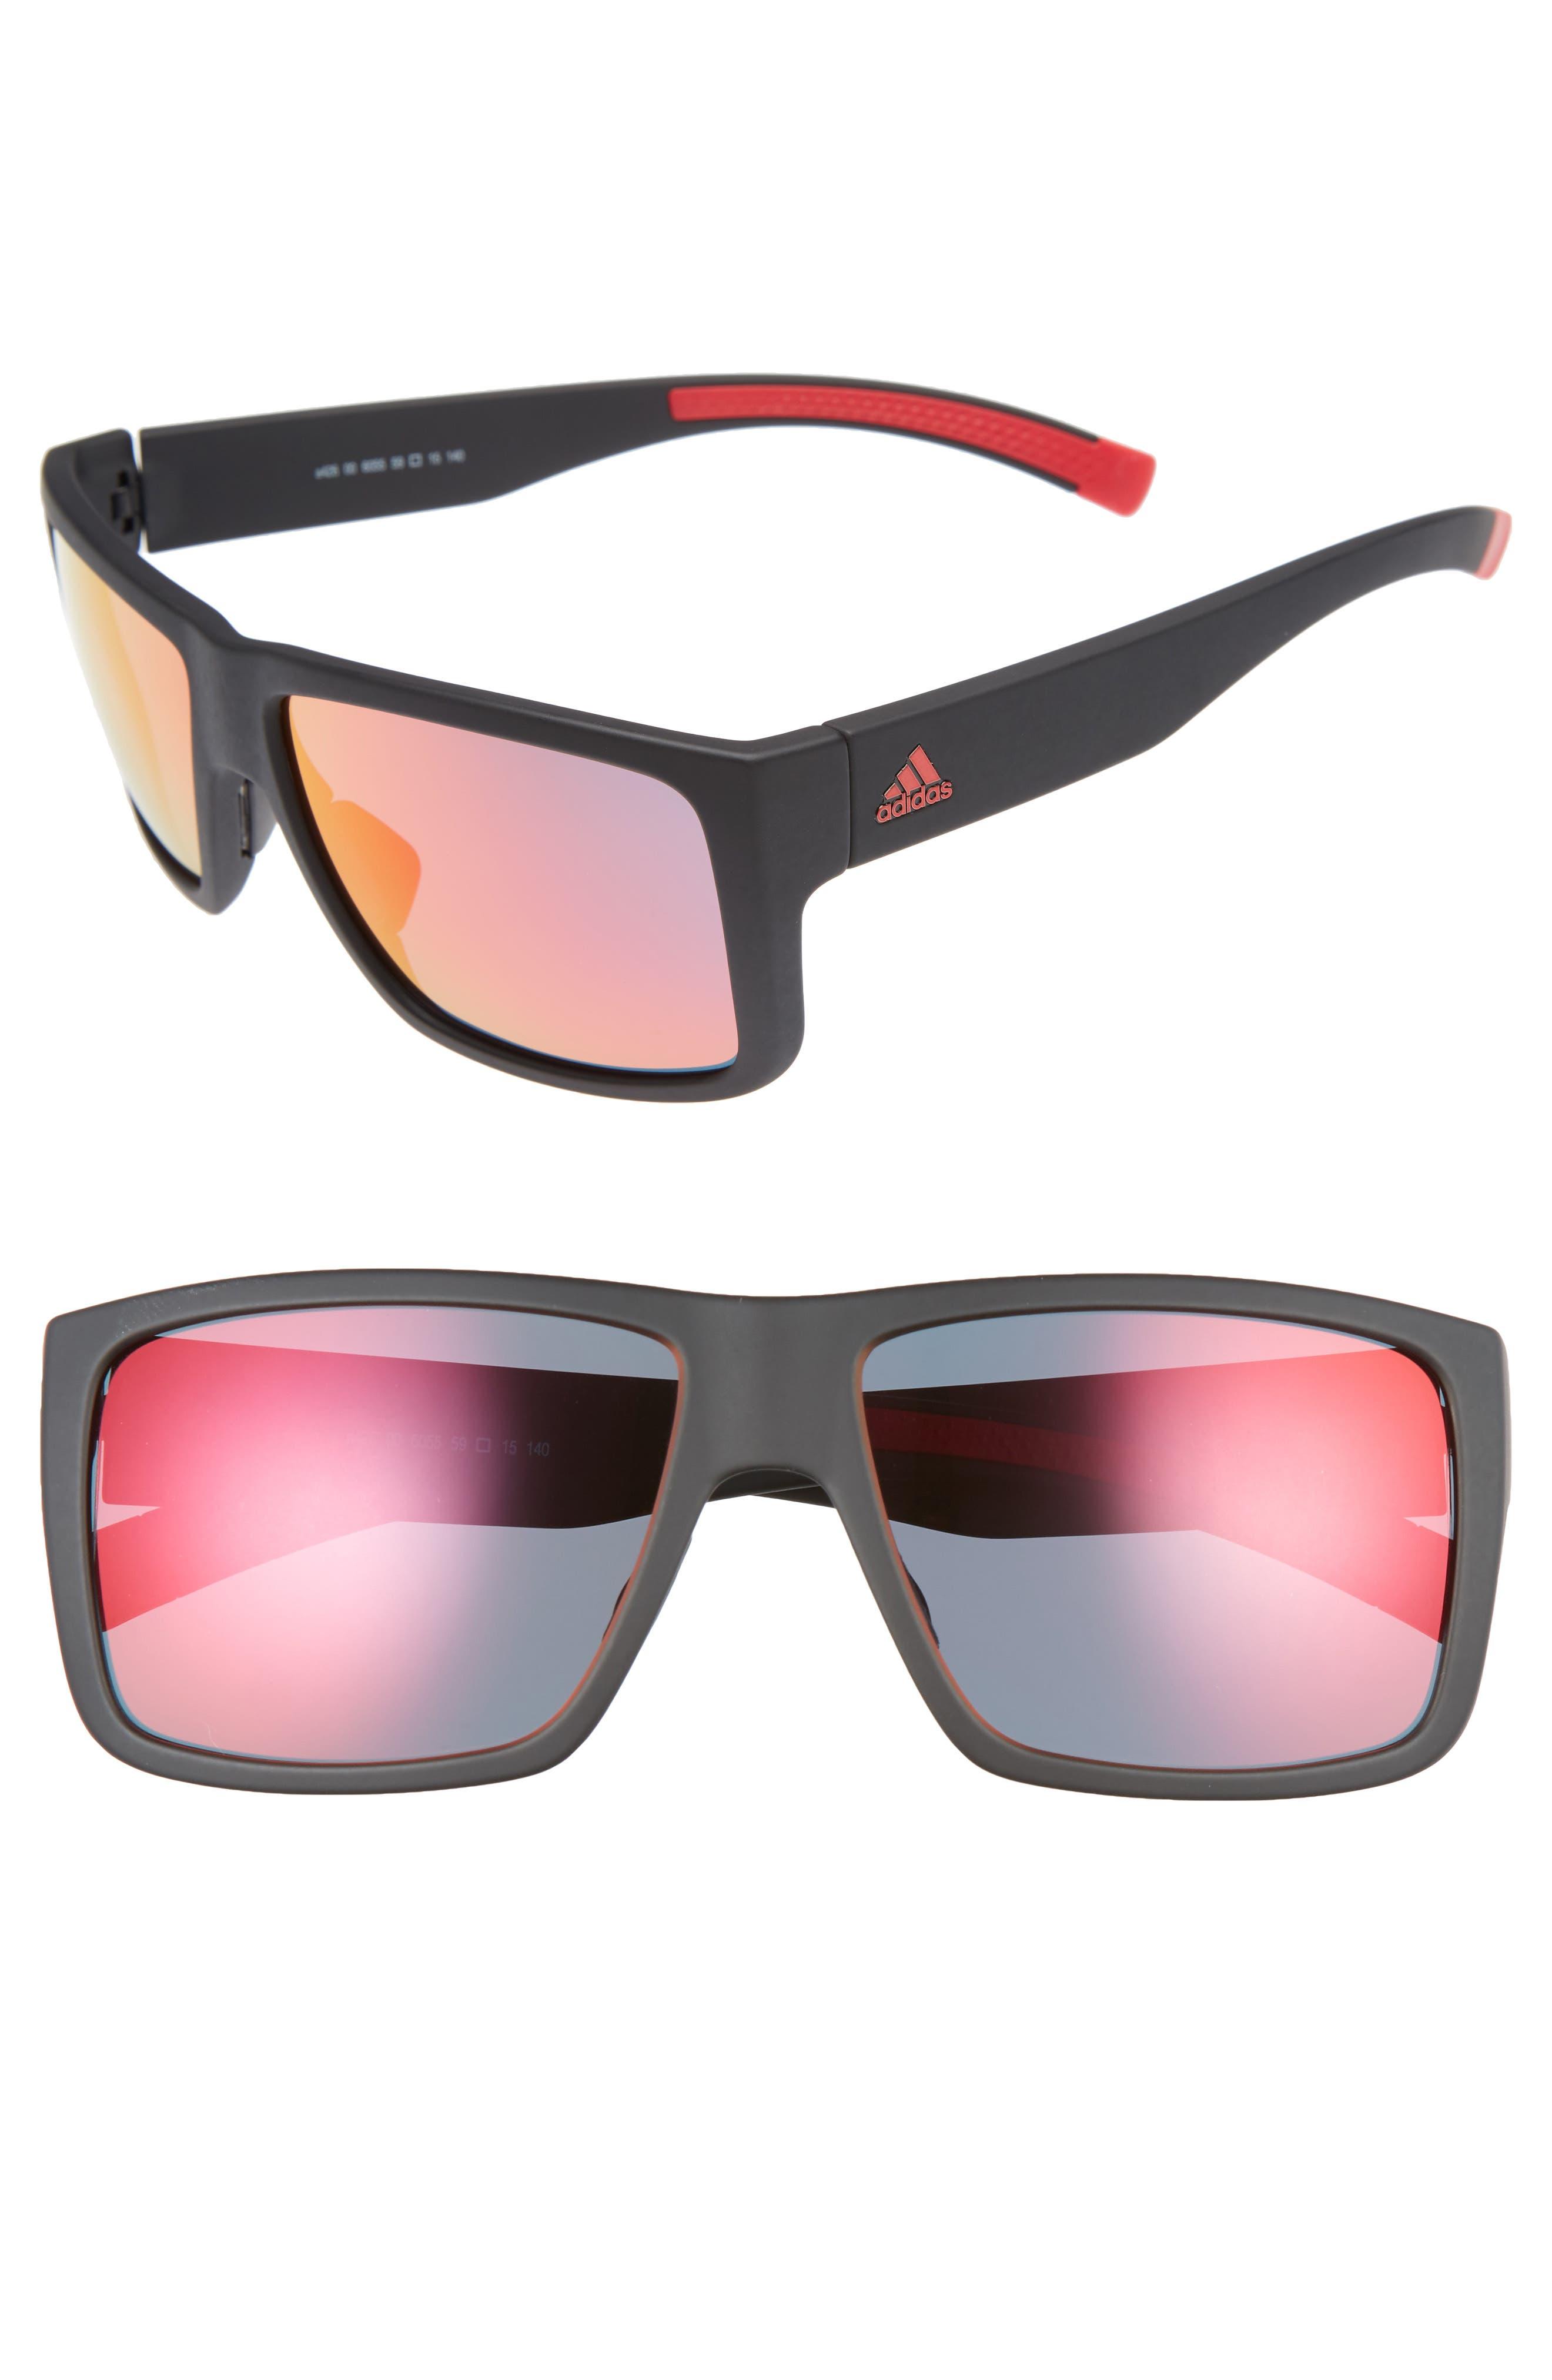 Matic 59mm Sunglasses,                             Main thumbnail 1, color,                             BLACK MATTE/ RED MIRROR